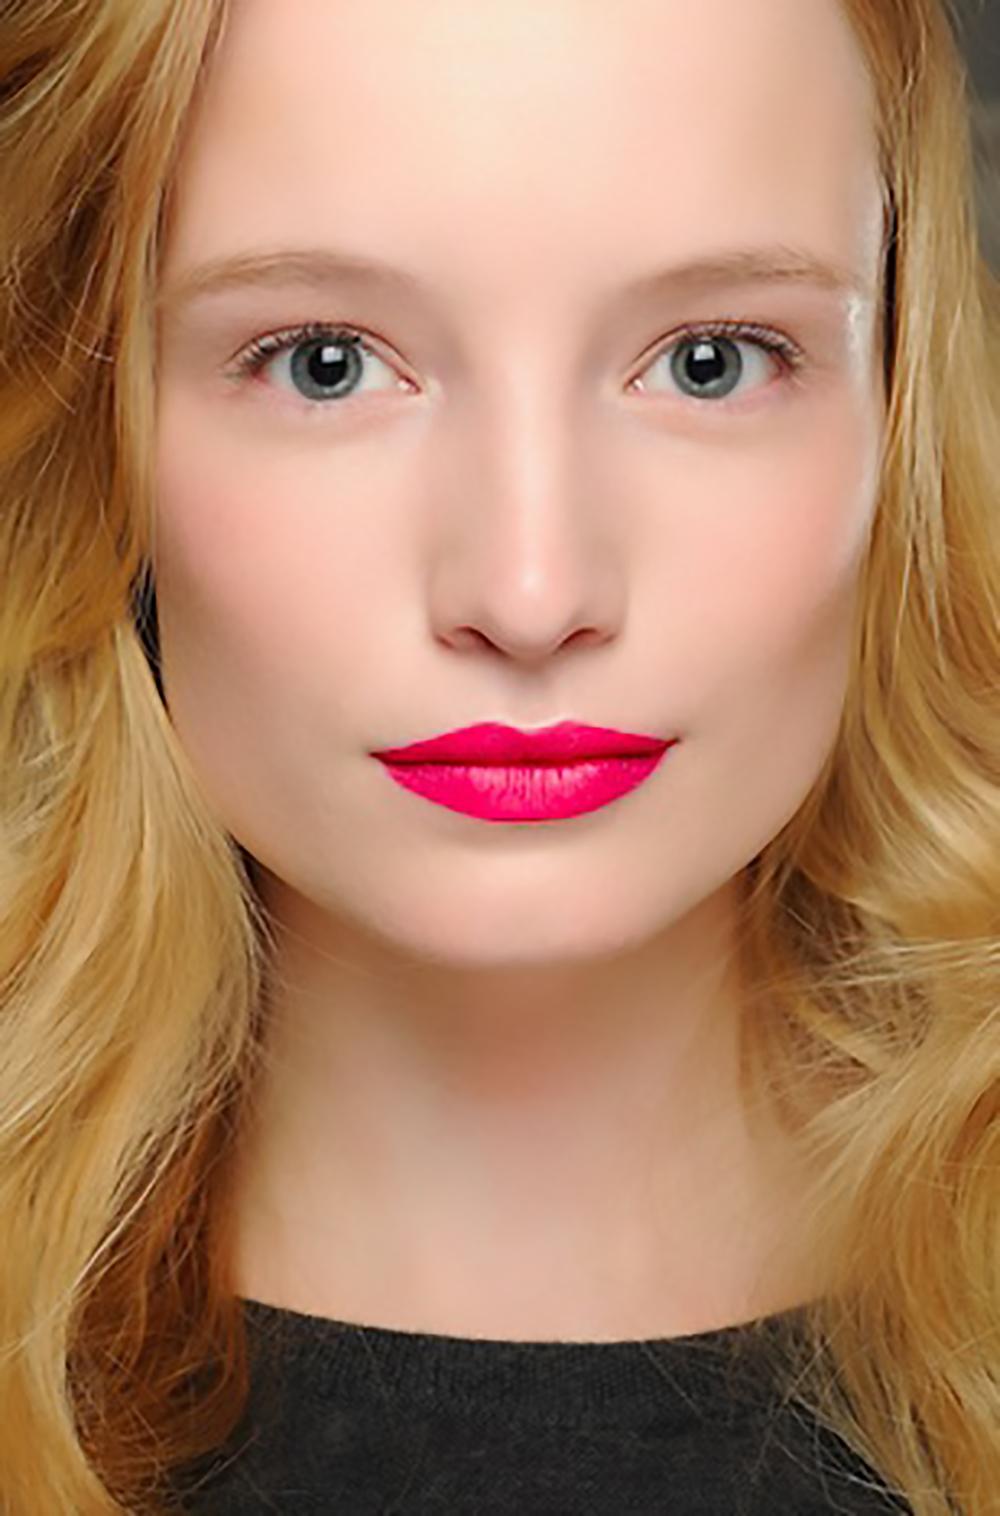 style.com diane von furstenberg beauty fall 2013 rtw 570 of 2511 lipstick 1500.jpg